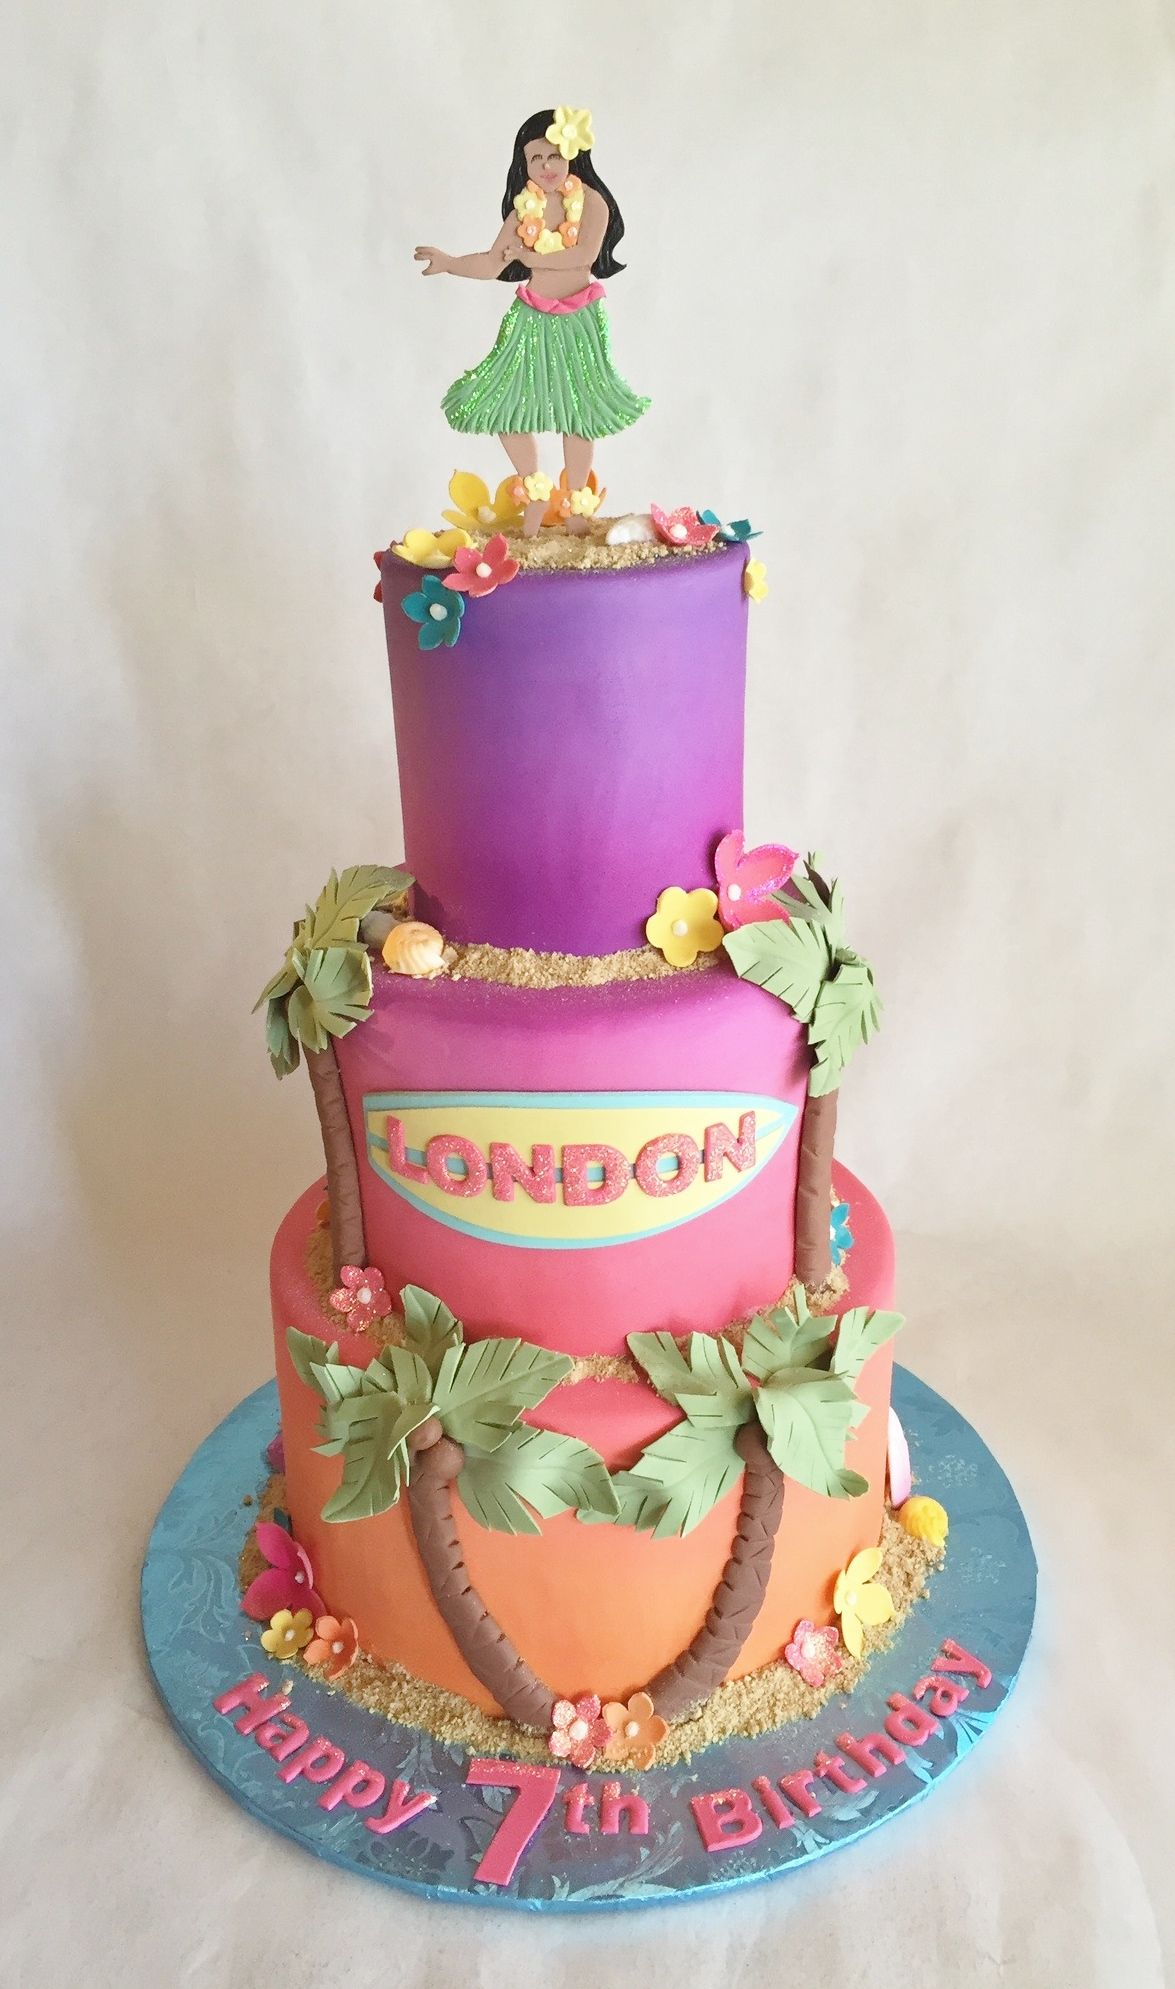 Birthday cake | Hawaiian | Hawaii | luau | hula girl | palm trees | fondant | sunset | sand | blossoms